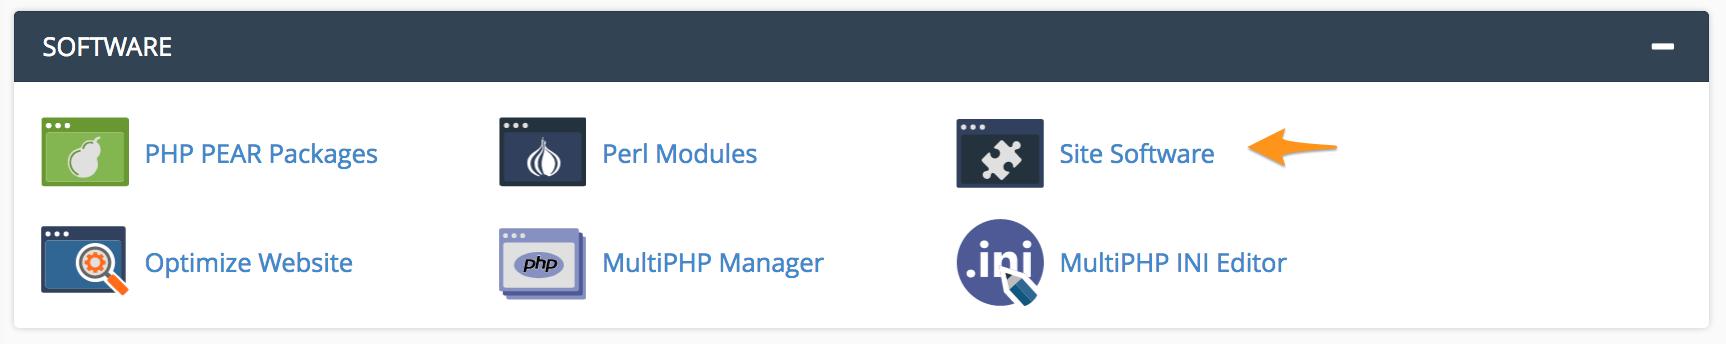 Site Software نصب کننده خودکار یا Installer برای وردپرس در cPanel